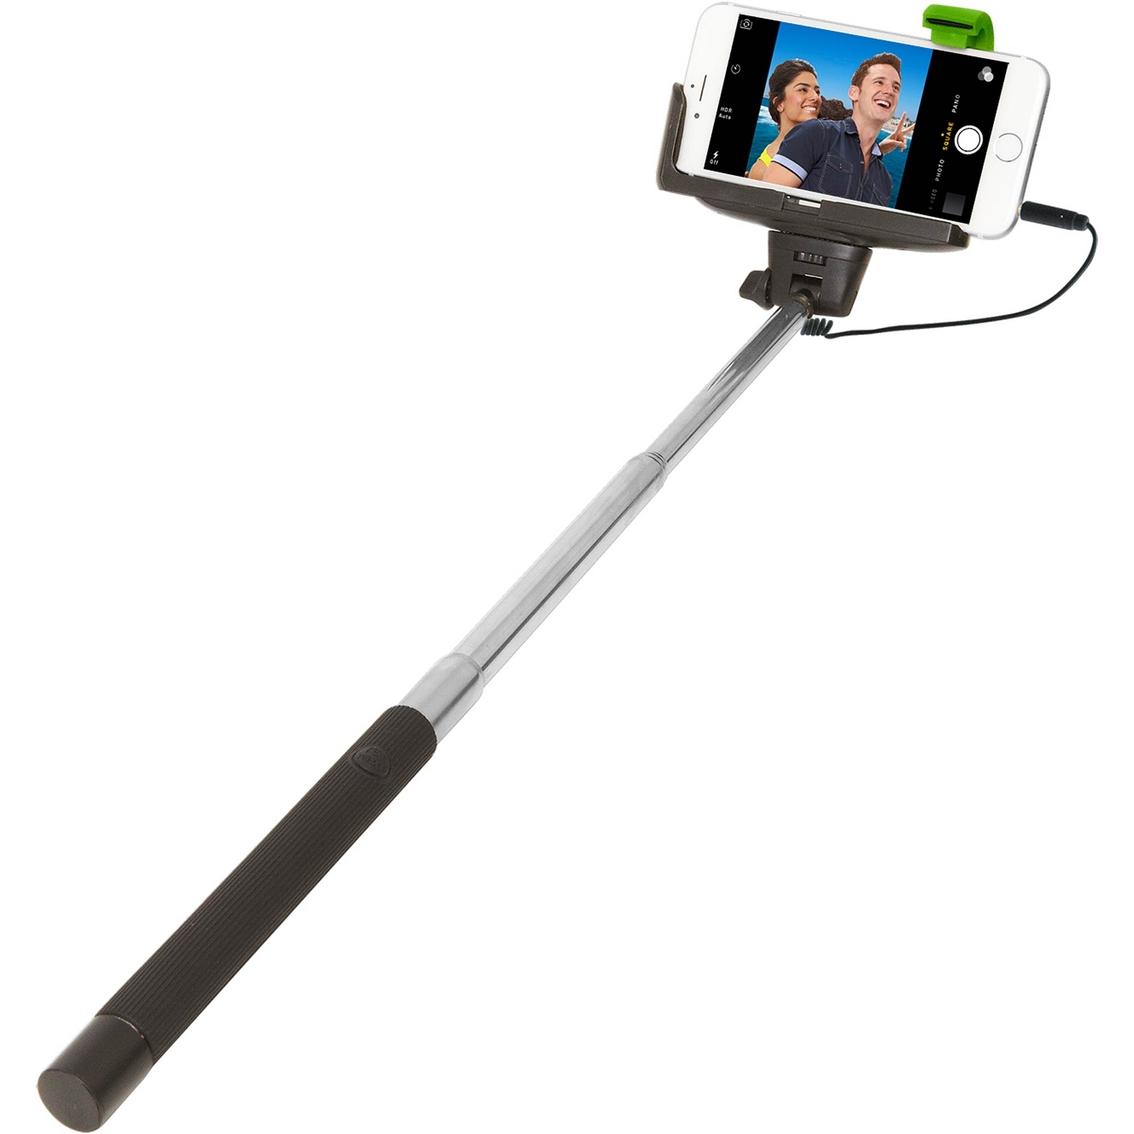 retrak selfie stick cell phone accessories electronics shop the exchange. Black Bedroom Furniture Sets. Home Design Ideas